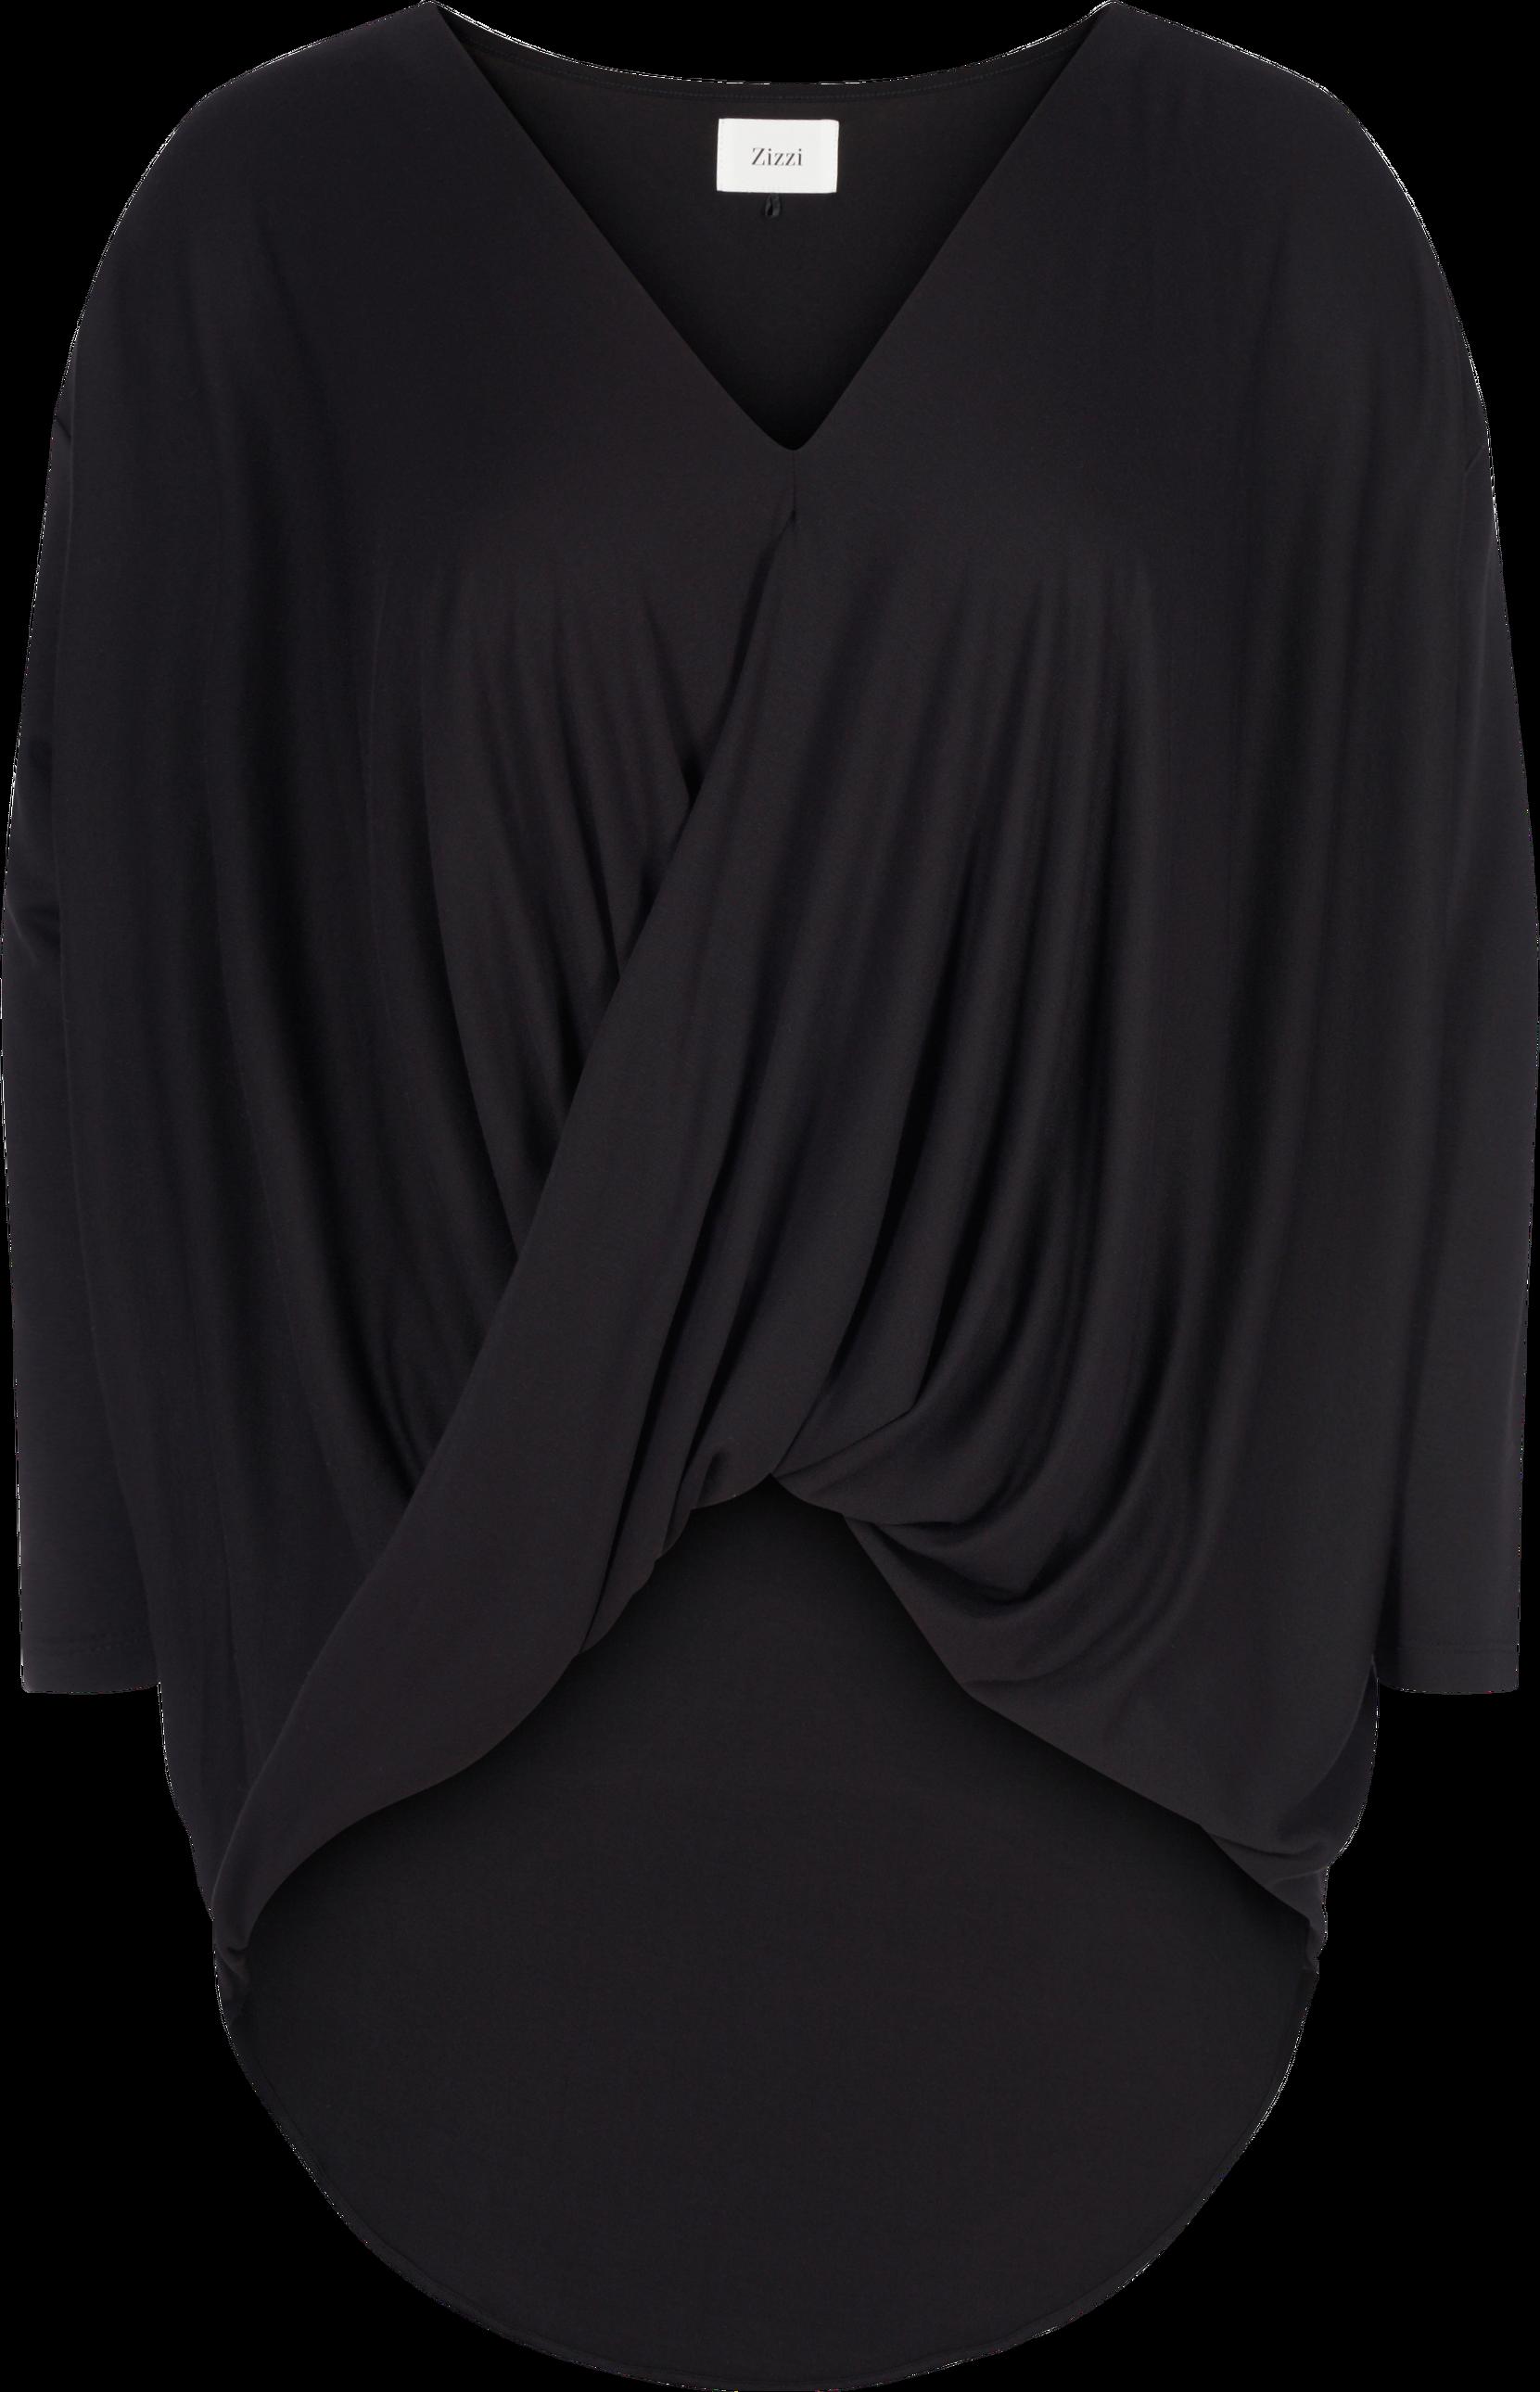 b090eac0311 Bluse med drapering Zizzi Skjorter & bluser til Kvinder i Sort